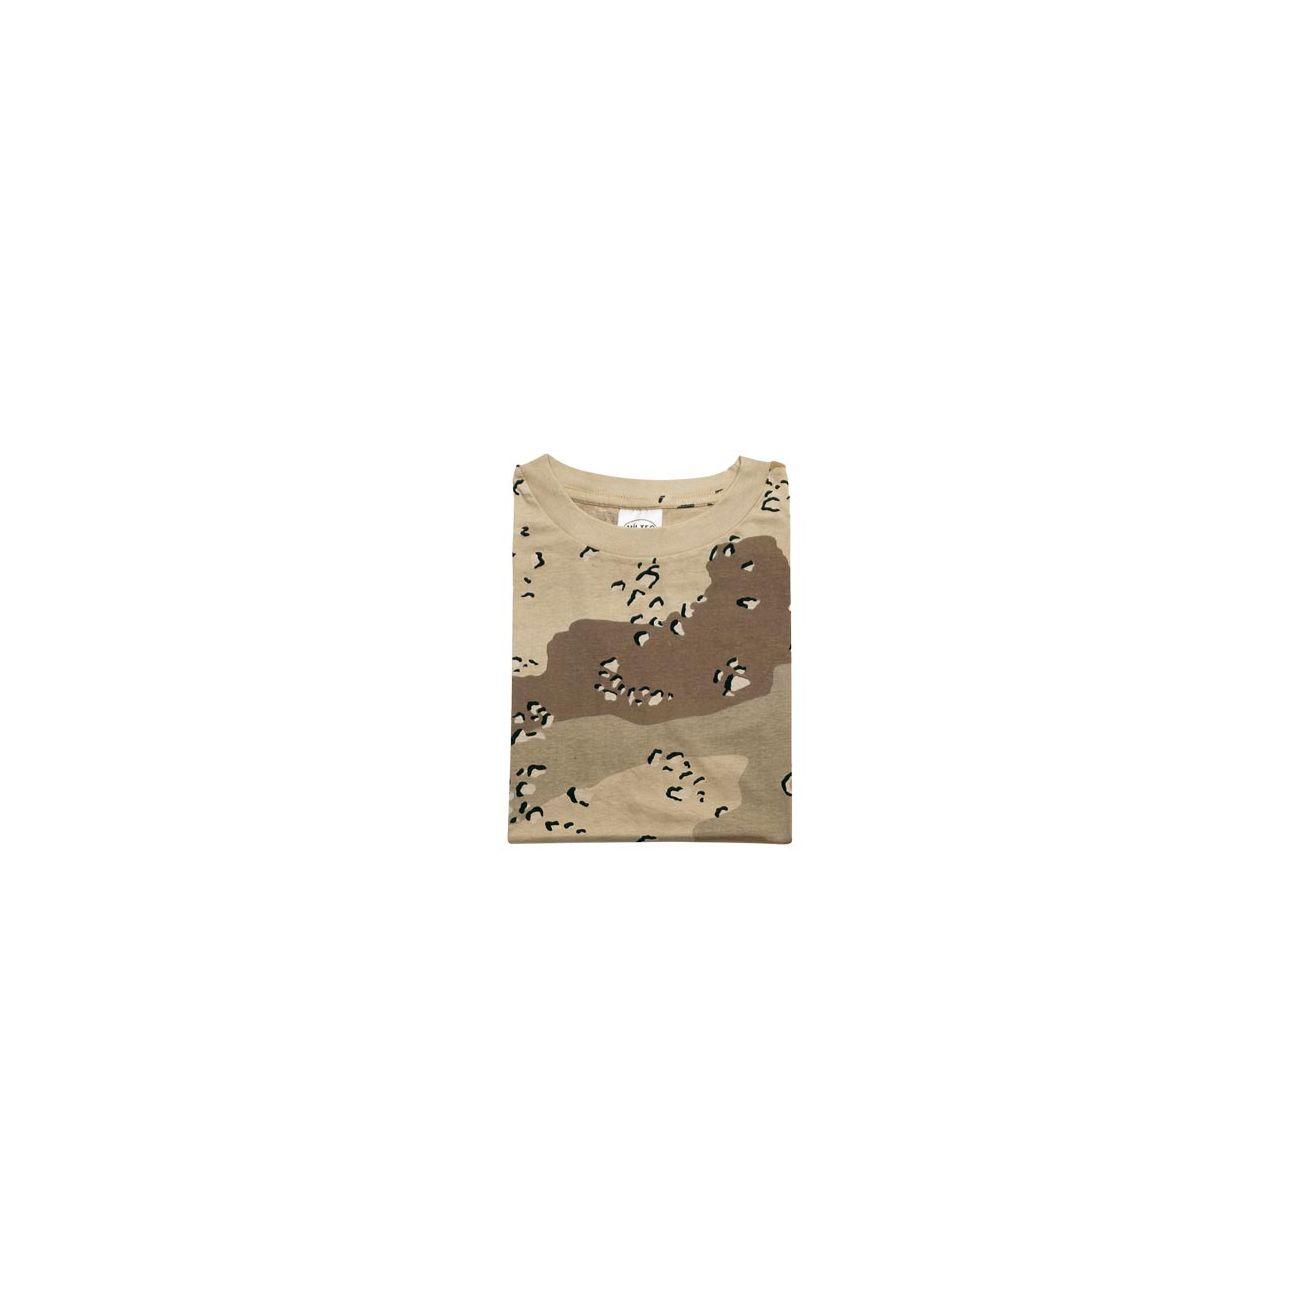 16f71603fa1f35 MFH T-Shirt halbarm 6-color-desert günstig kaufen - Kotte & Zeller